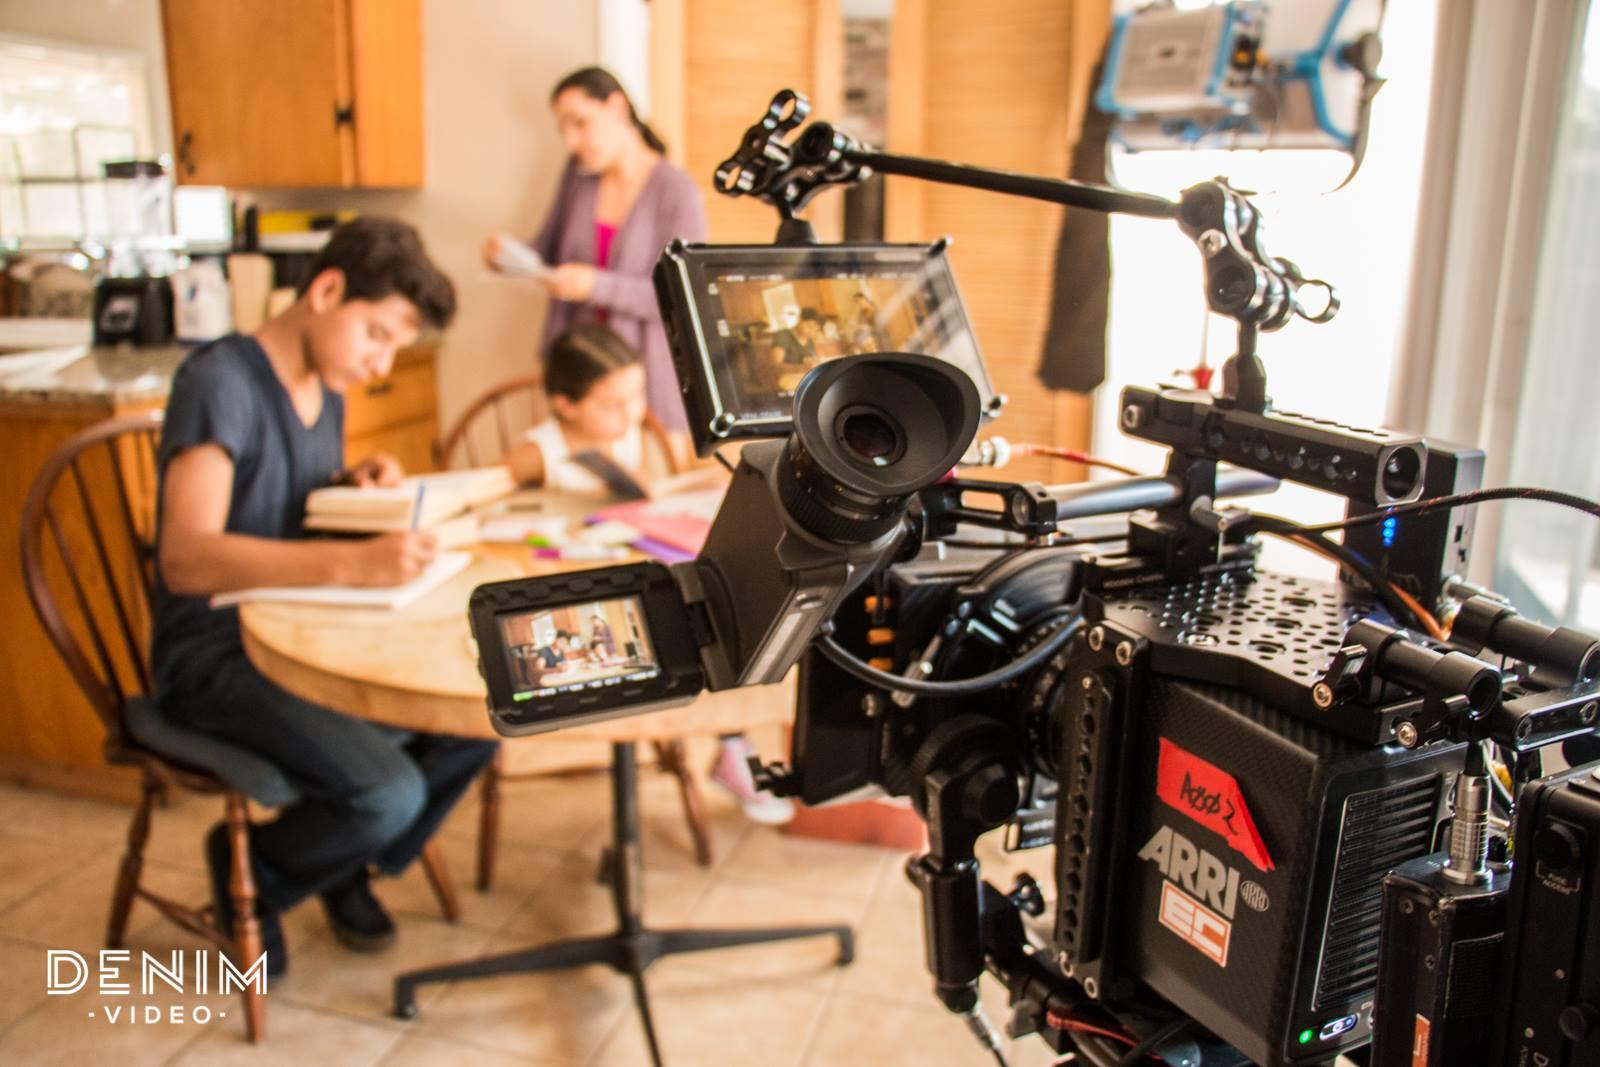 On Denim Video Film Set 1